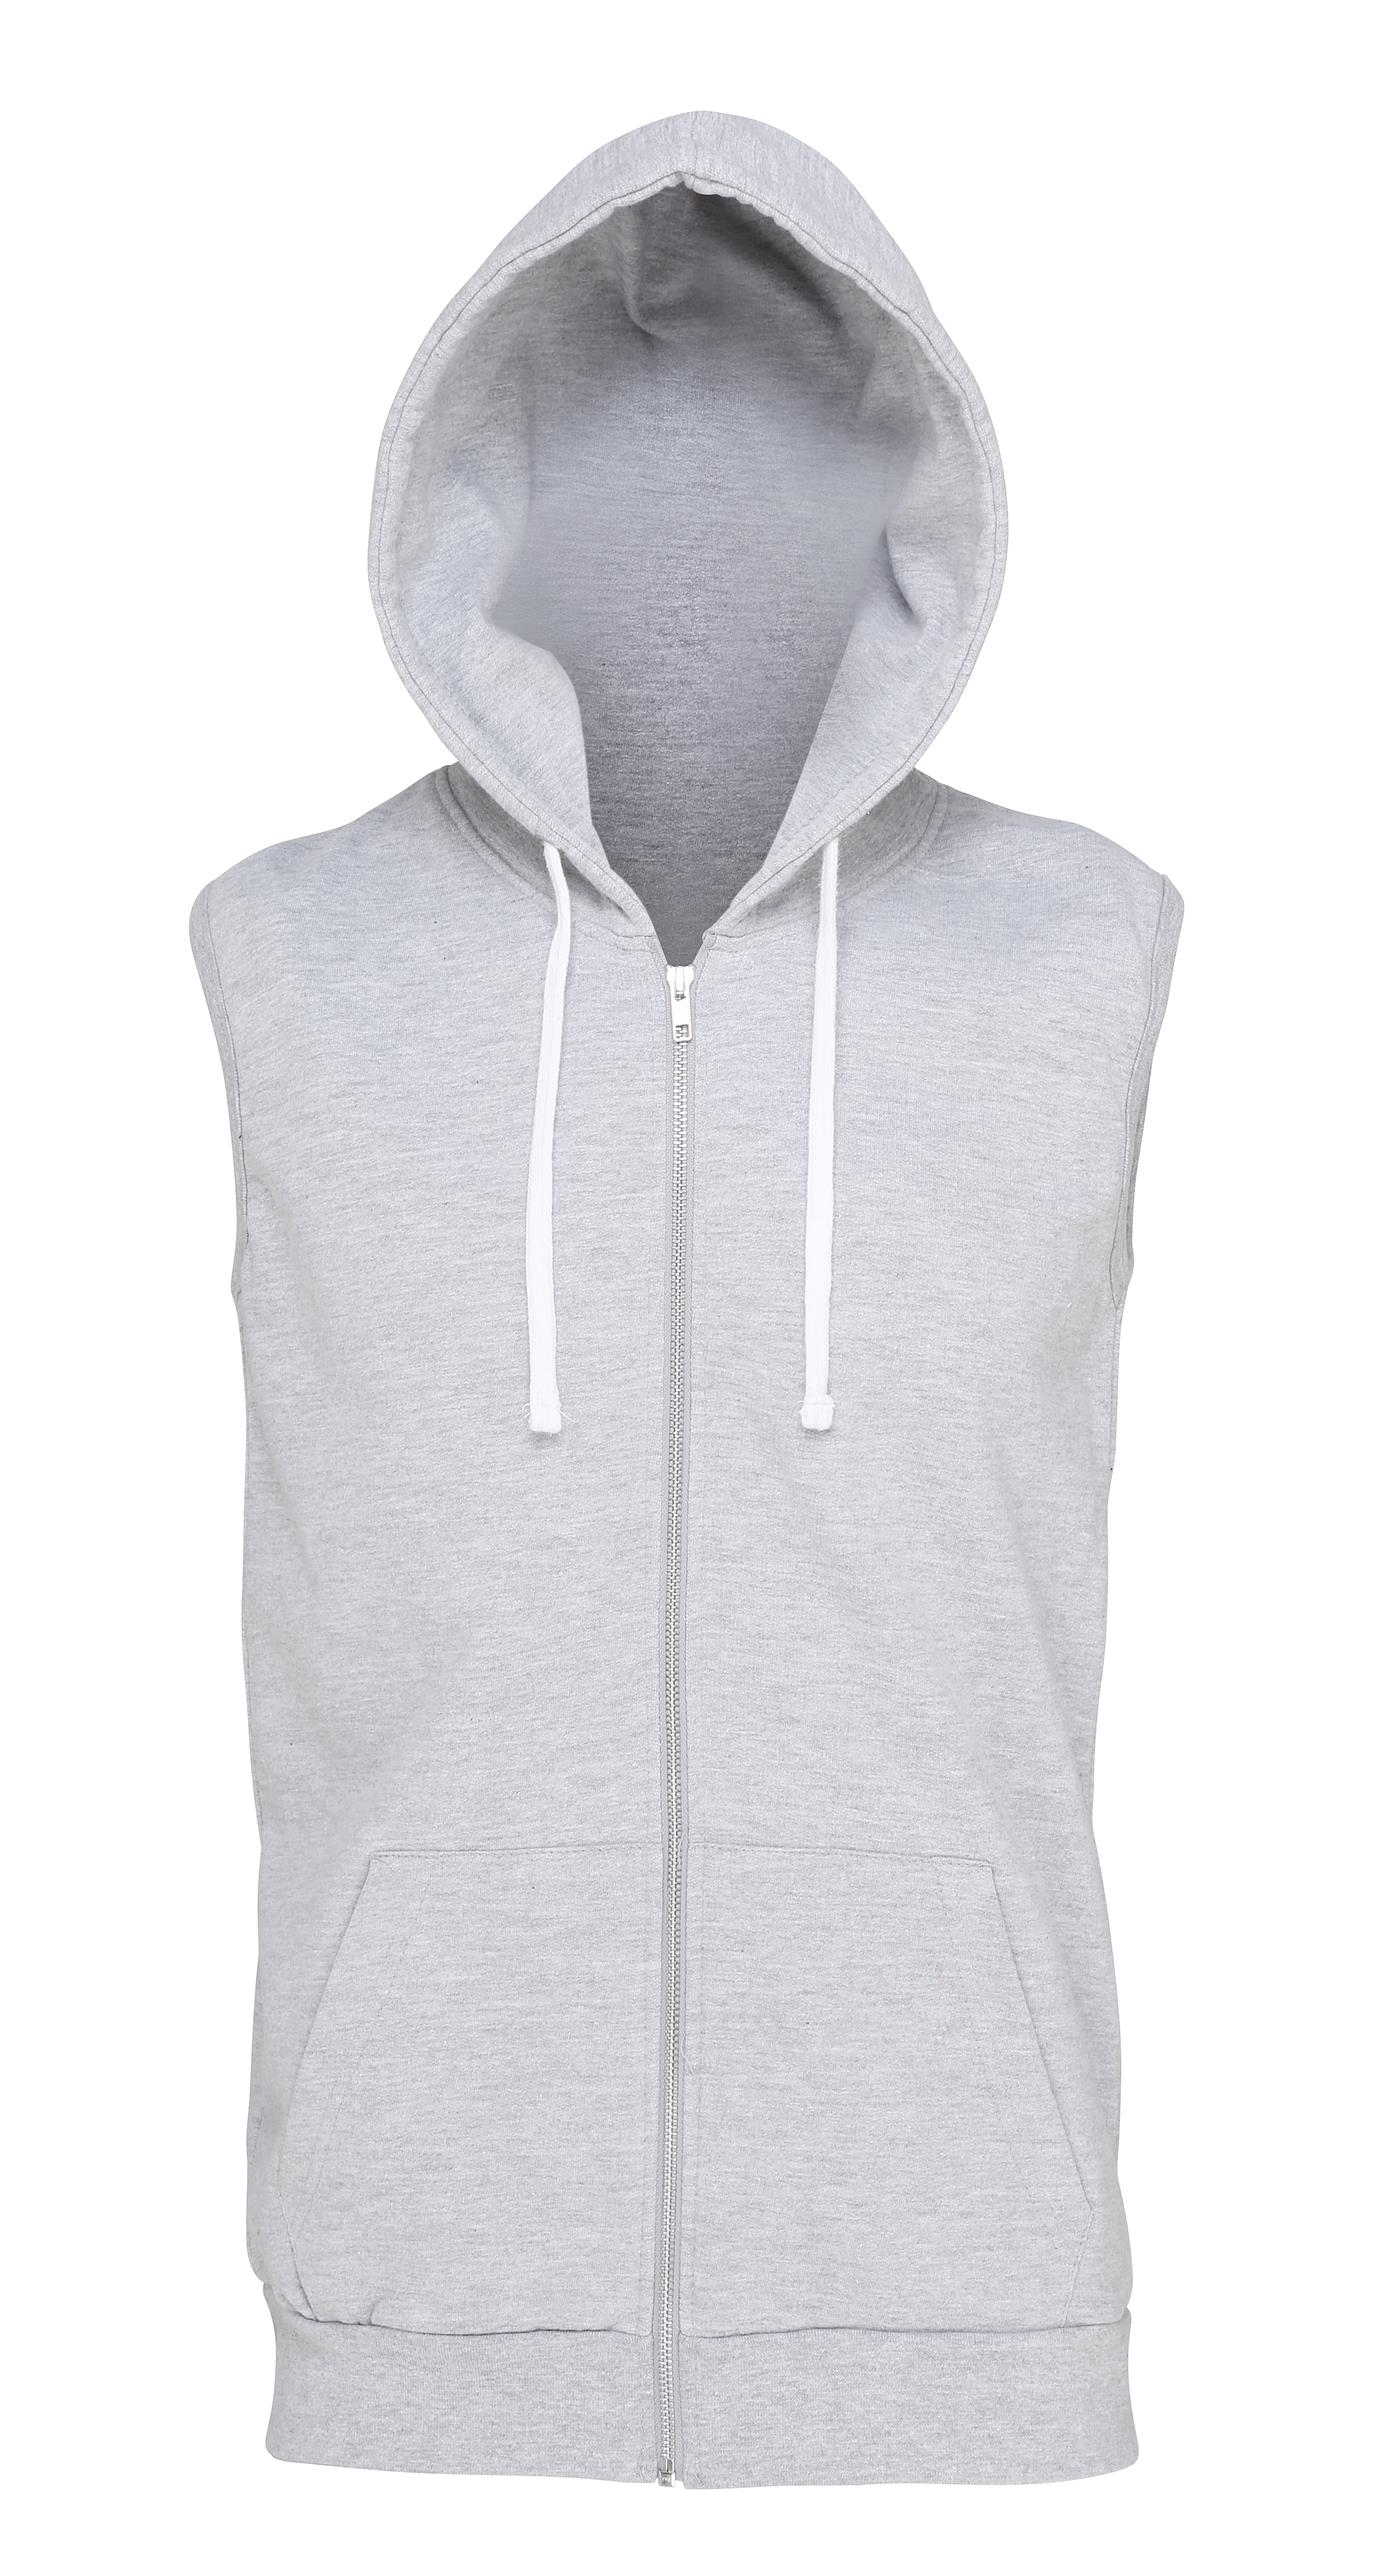 New Mens AWDis Hoods Drawcord Full Zip Sleeveless Casual Hooded Tops Size S-XXL